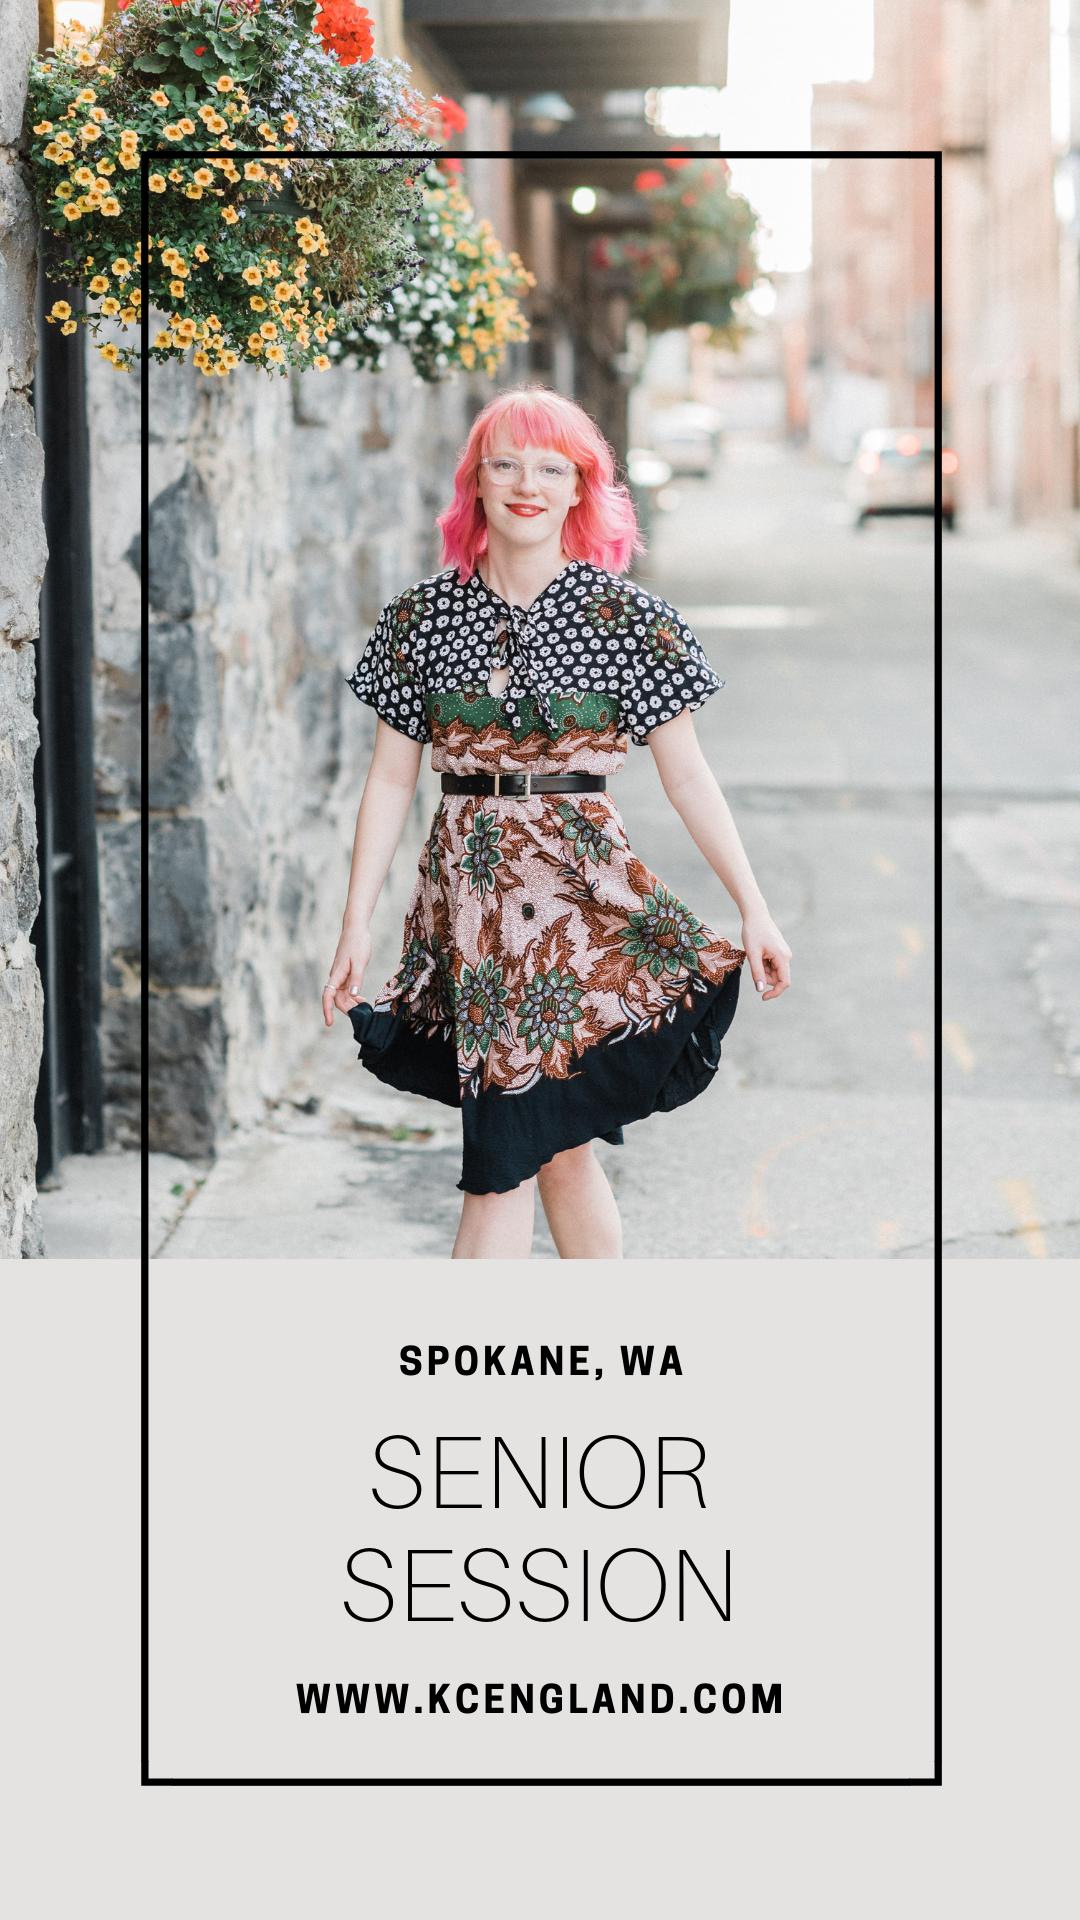 spokane_urban_senior_session_hailey_dightman